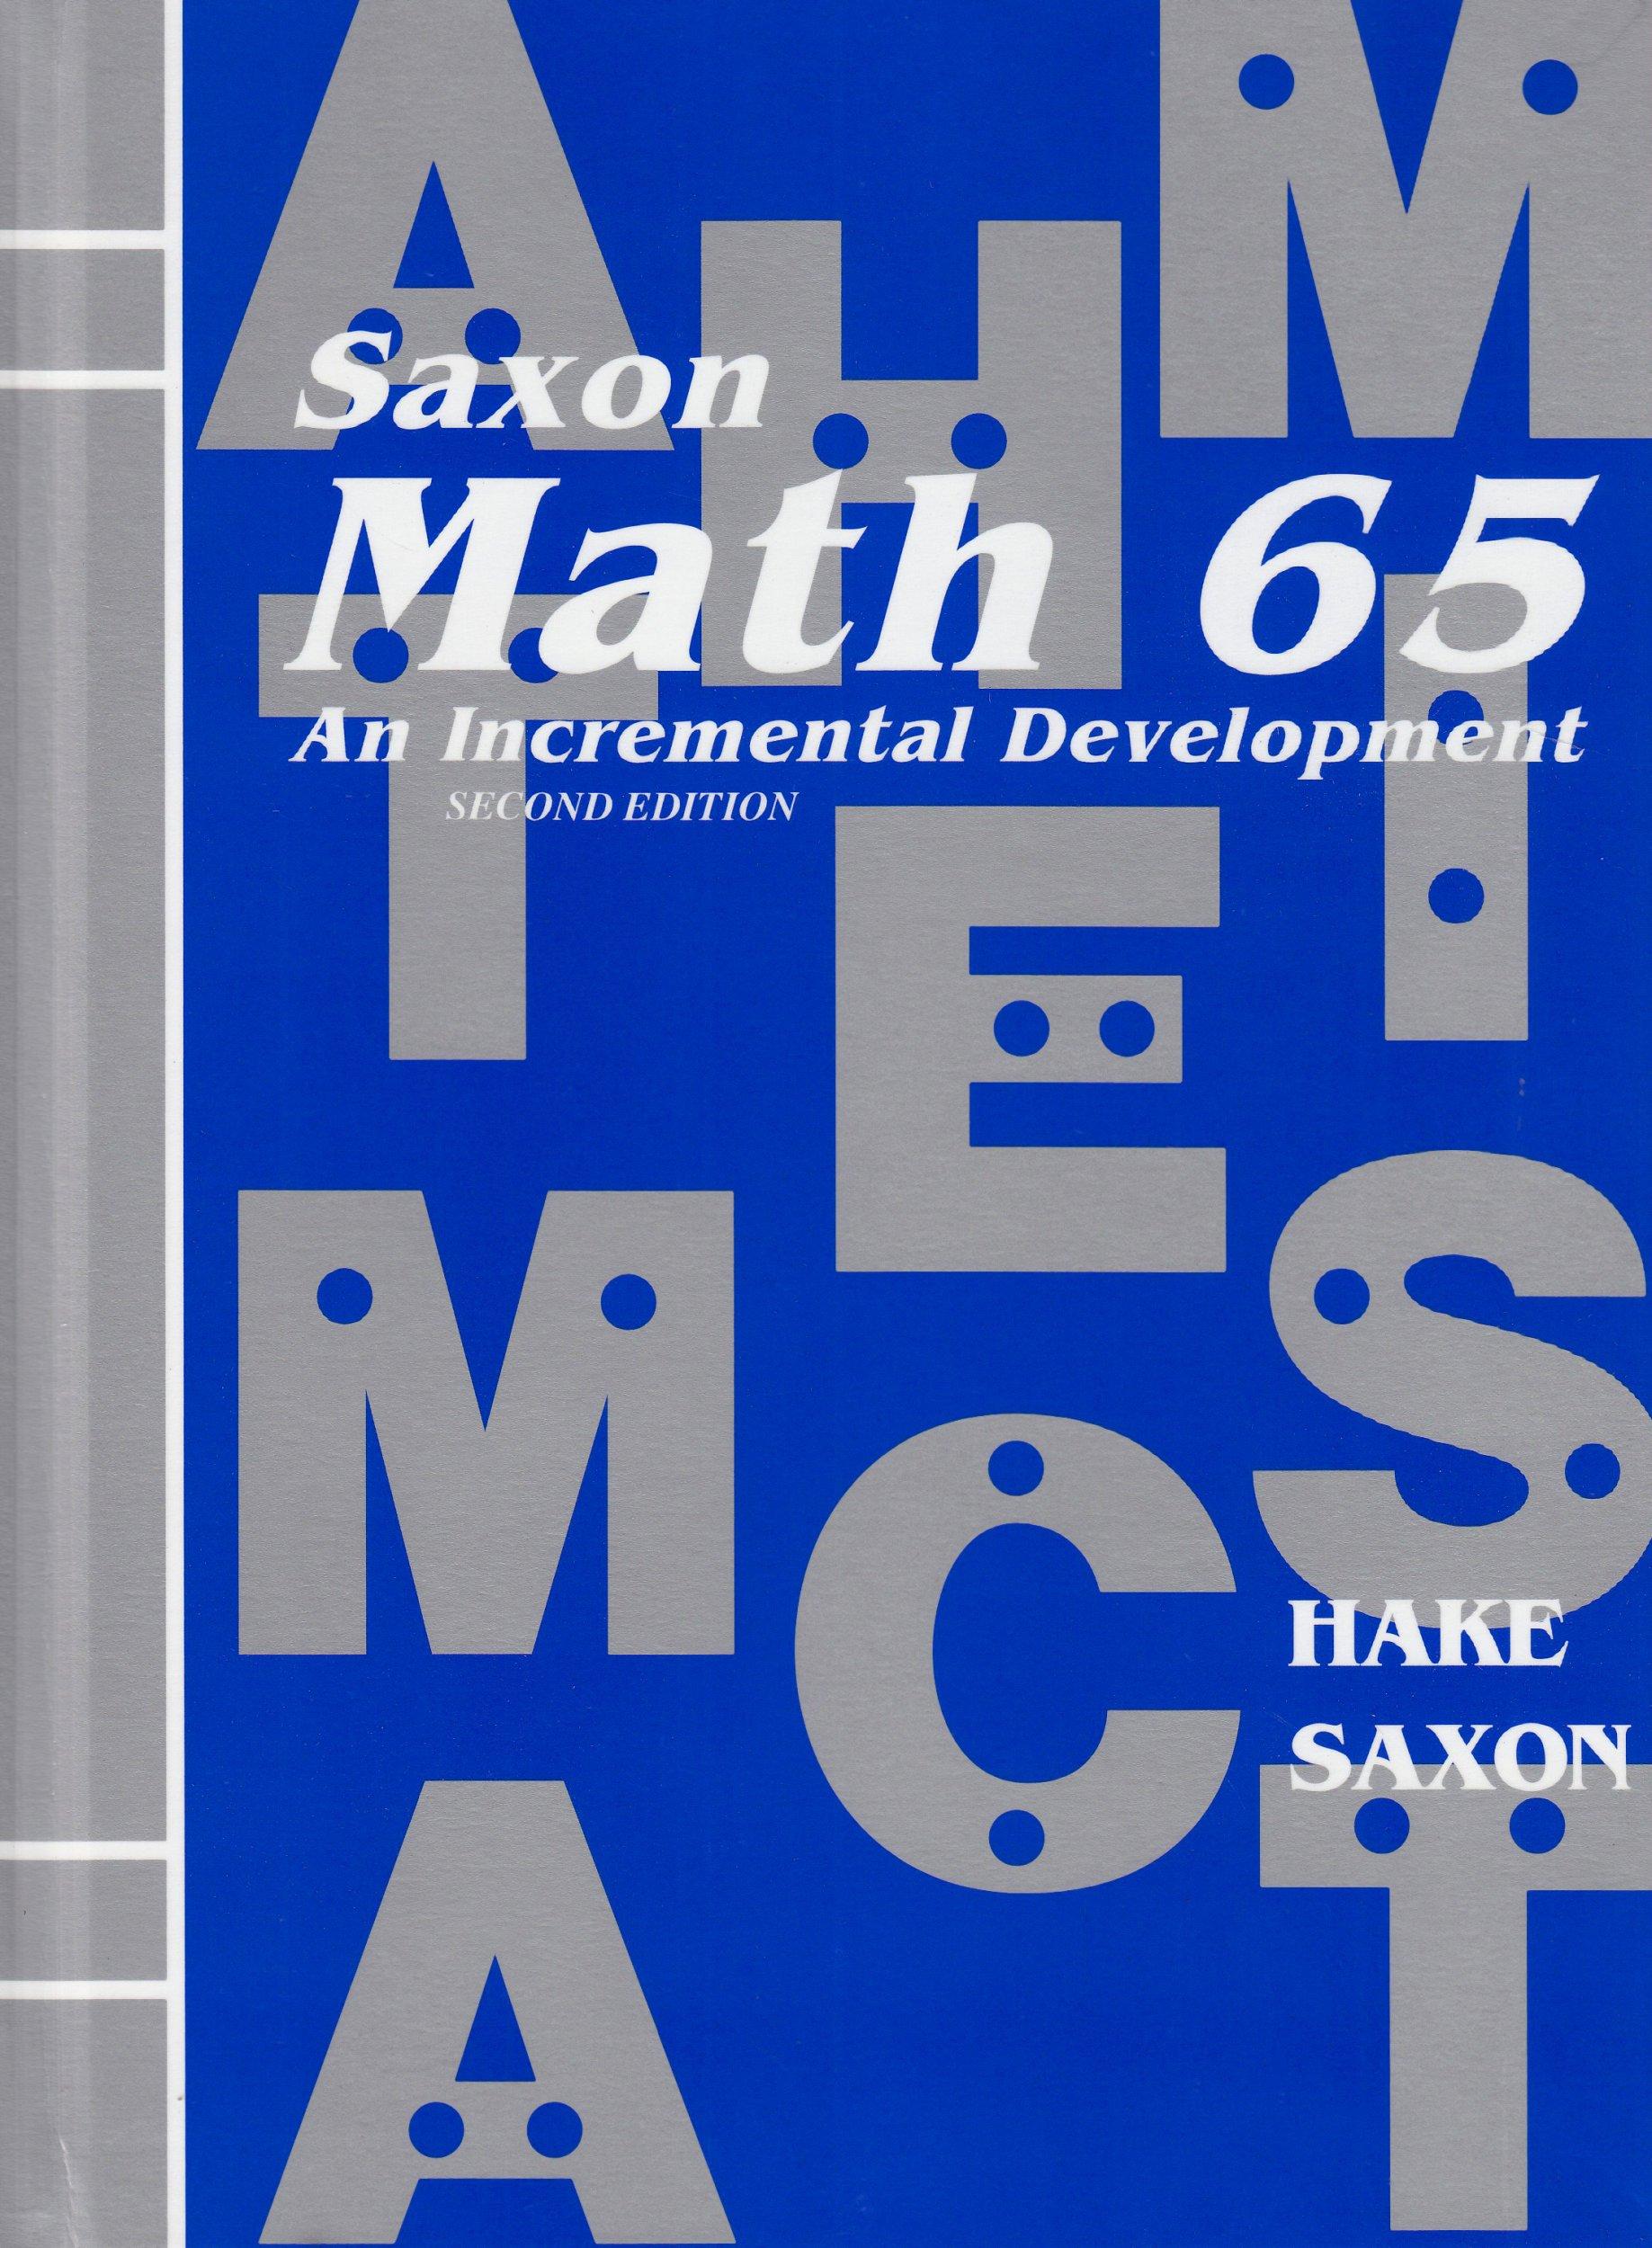 Math 65: An Incremental Development by Brand: Saxon Publishers (Image #1)